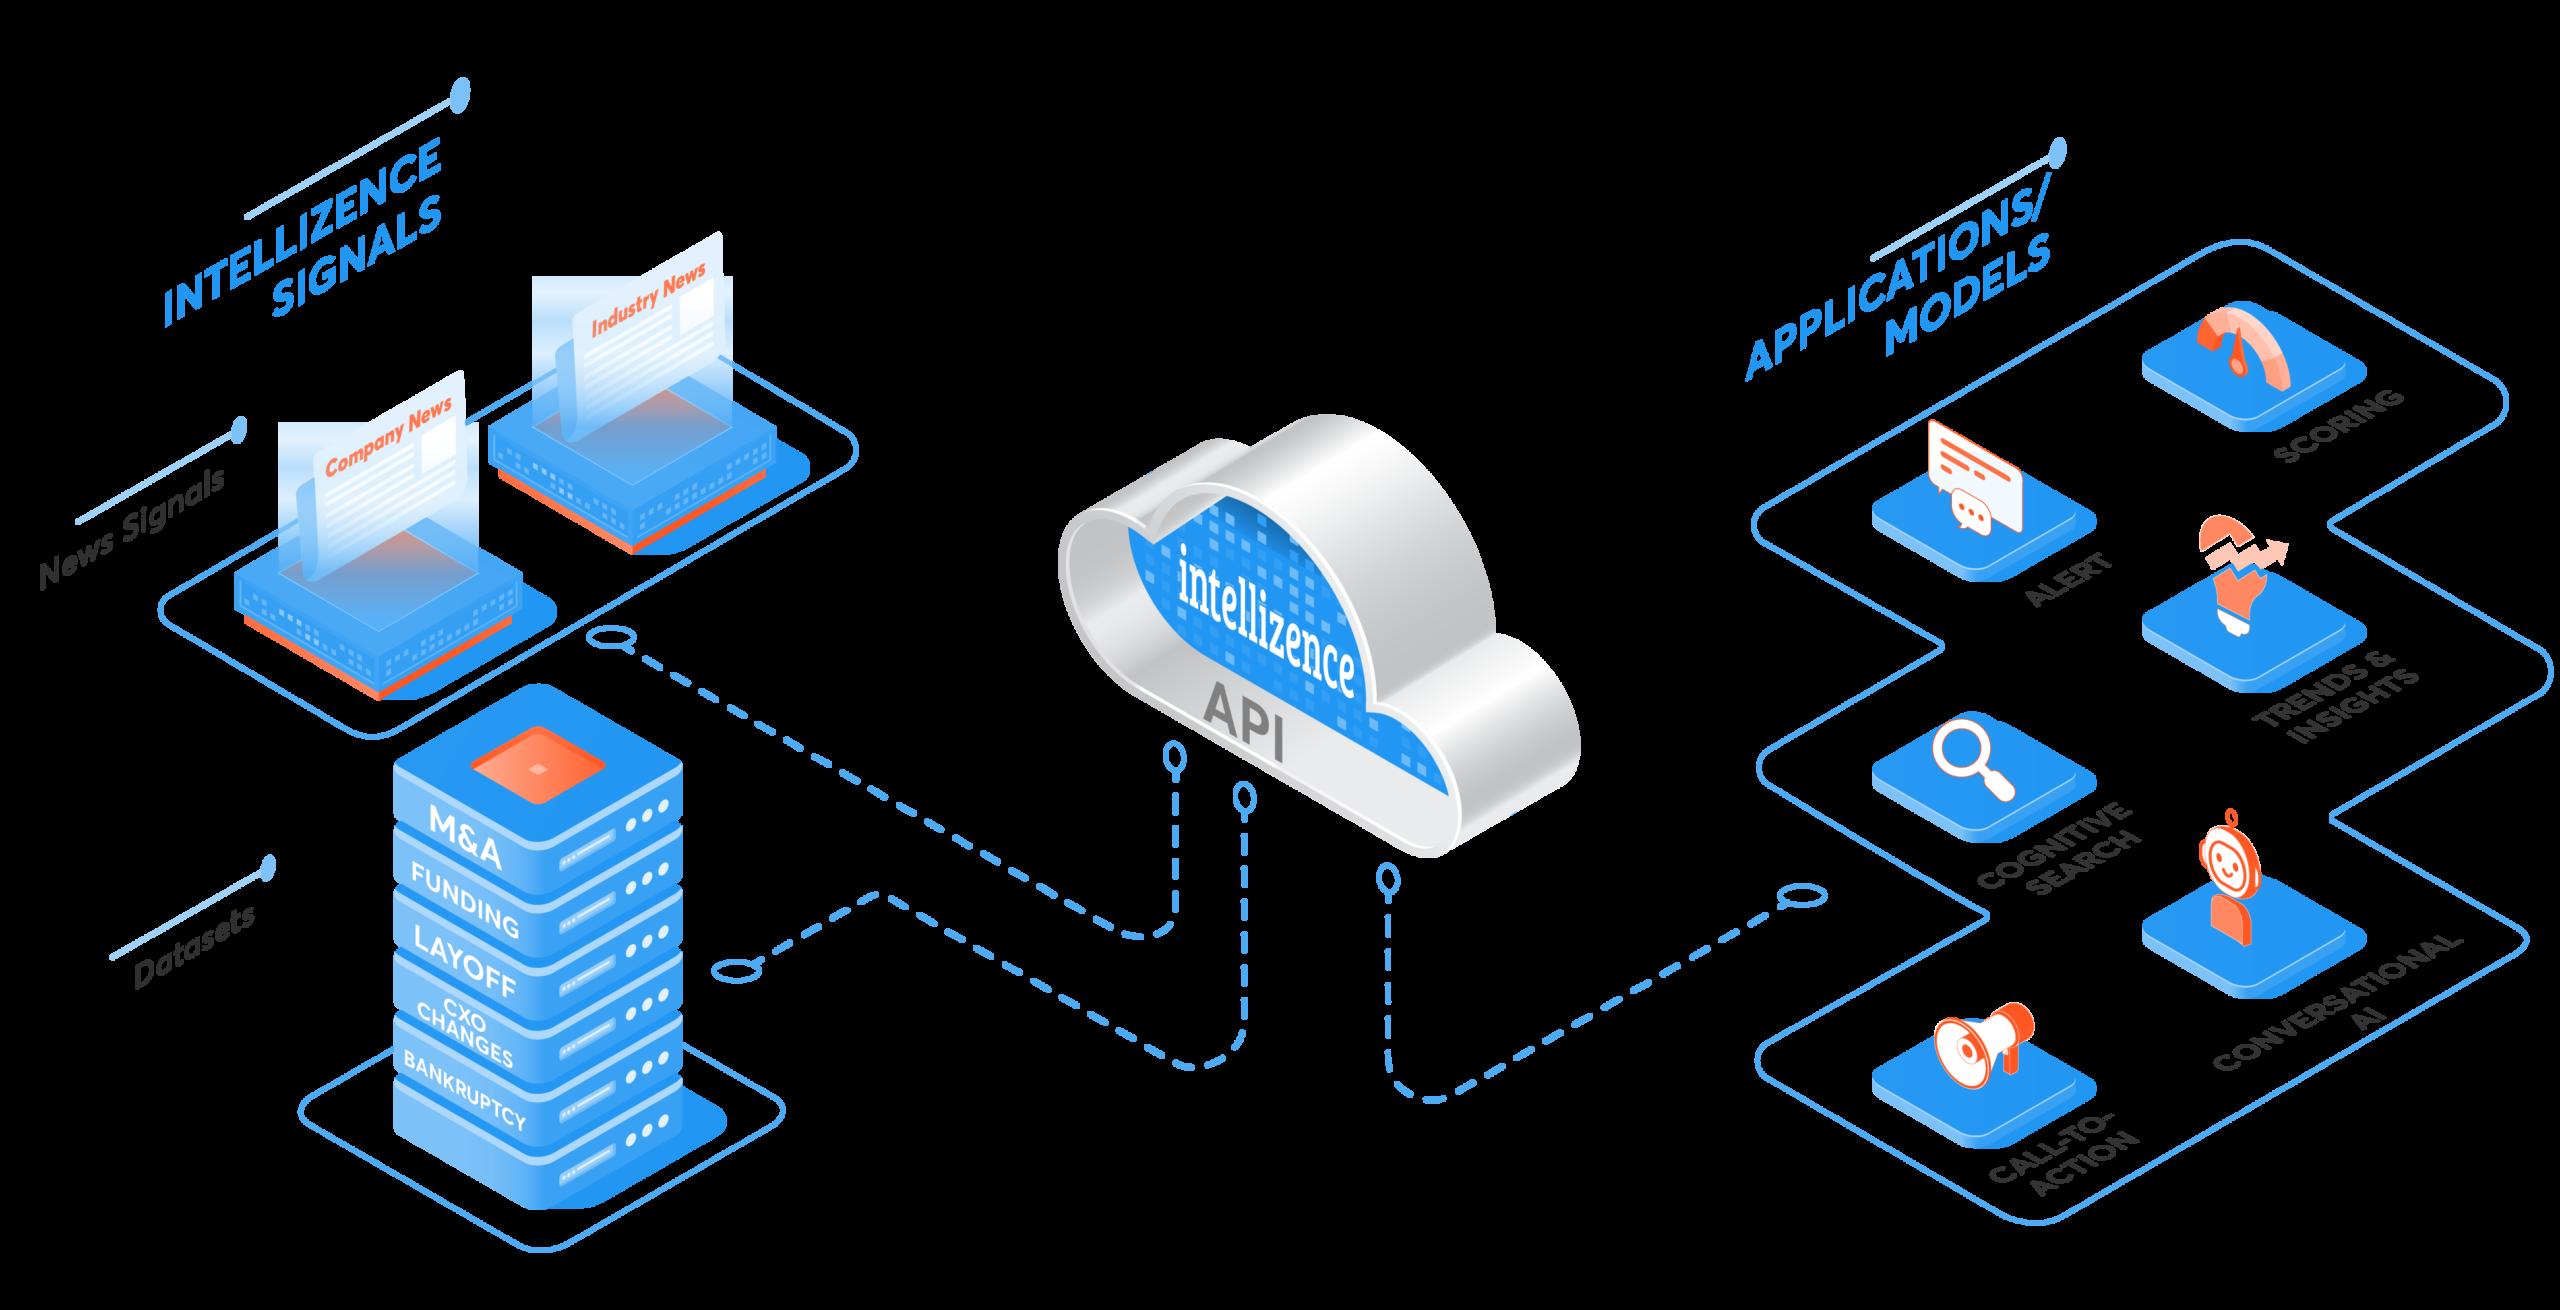 Intellizence Data_API Enrichment_Technology Platforms & Data Sciencepng